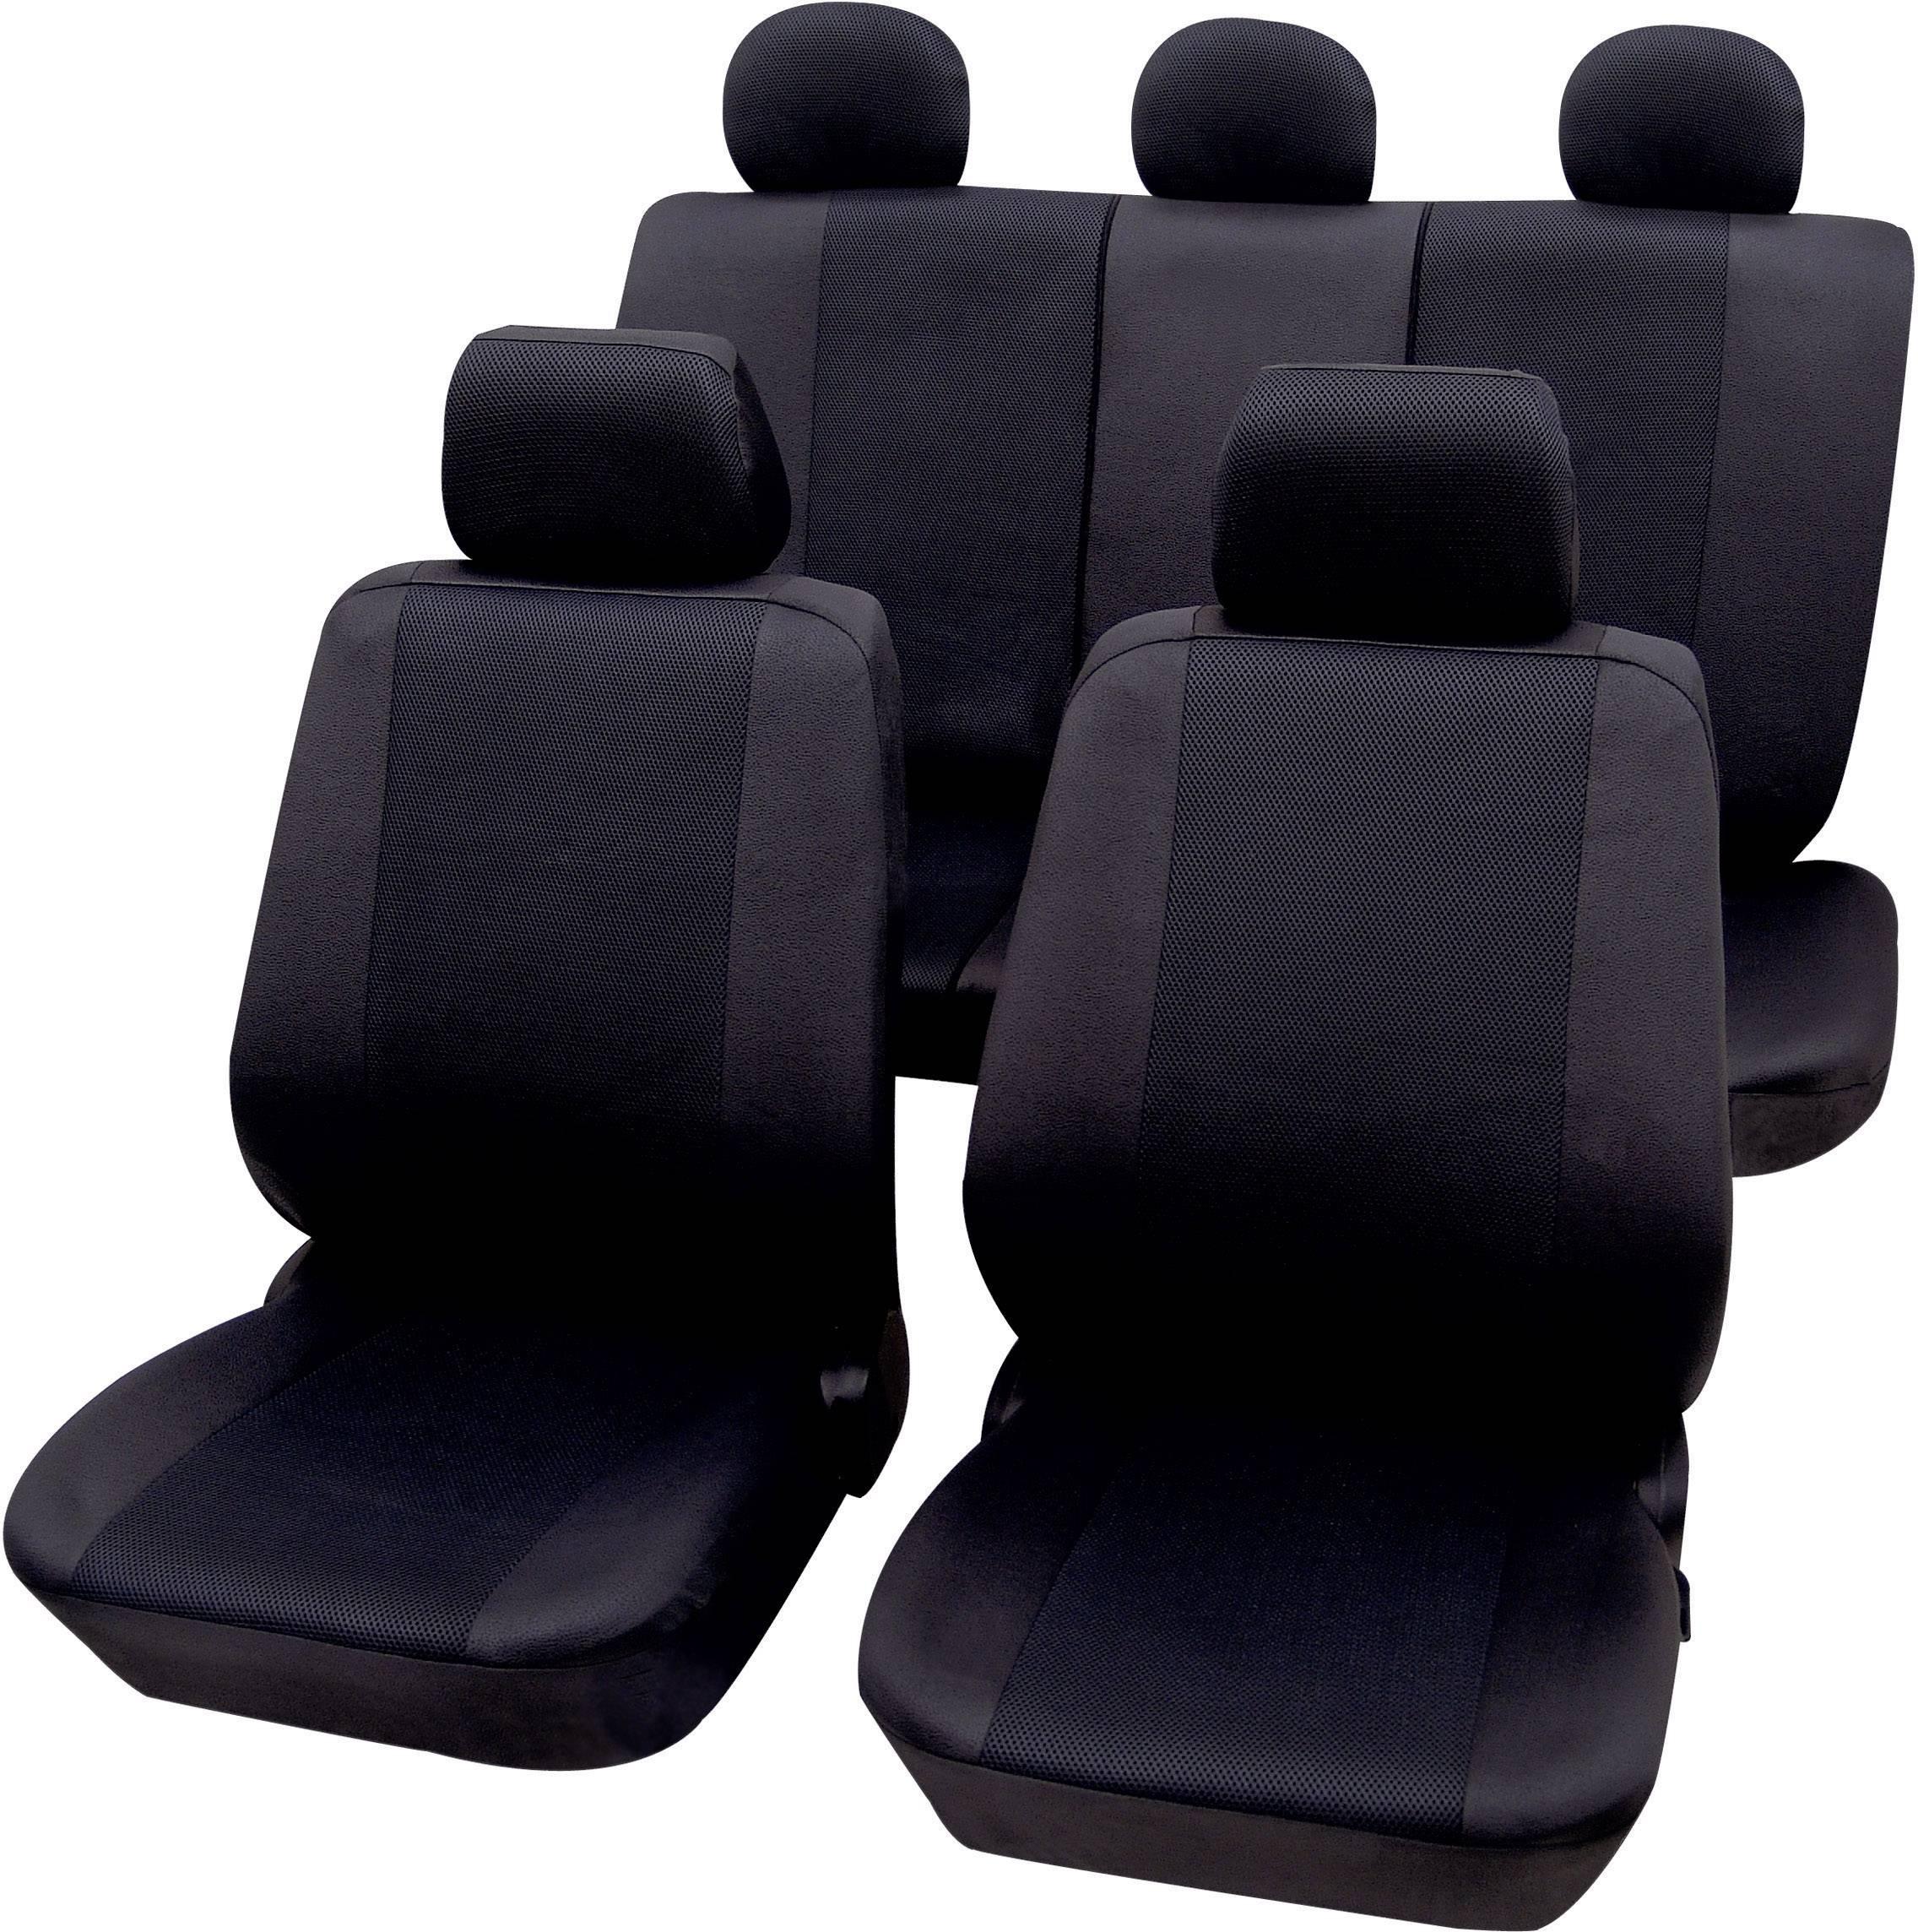 Autopoťahy Petex Sydney 26174804, 11-dielna, polyester, čierna